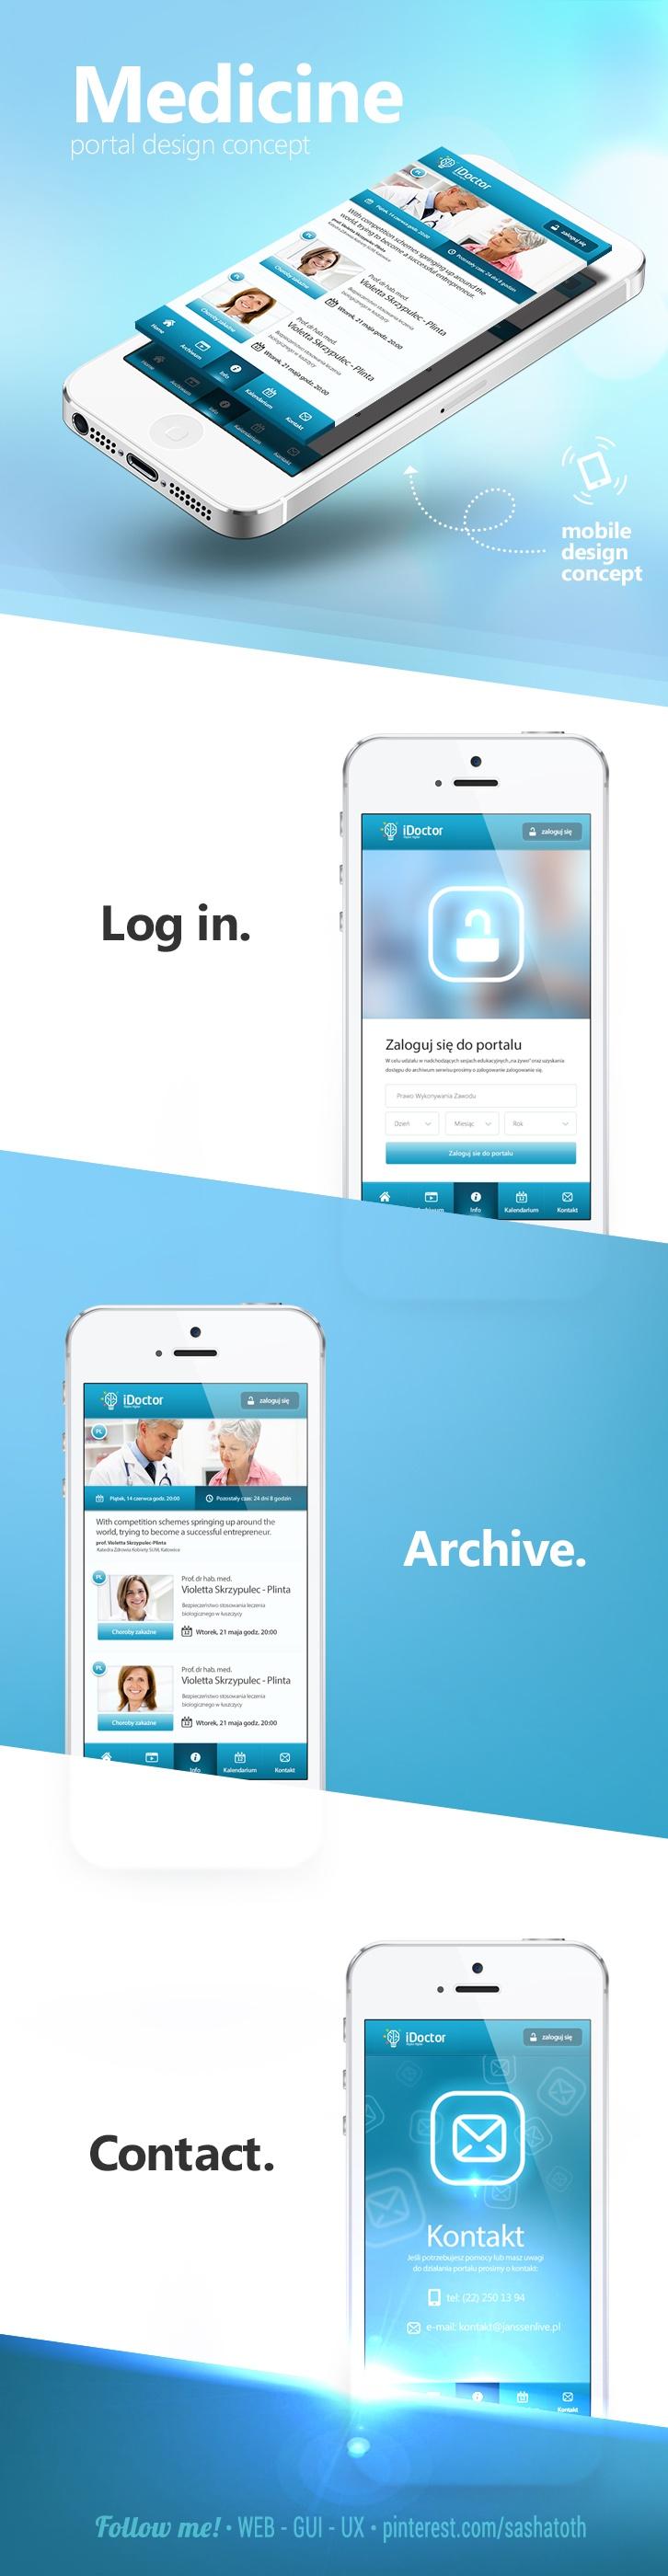 Medicine portal design concept by Jarek Pastuszak *** #app #gui #ui #behance